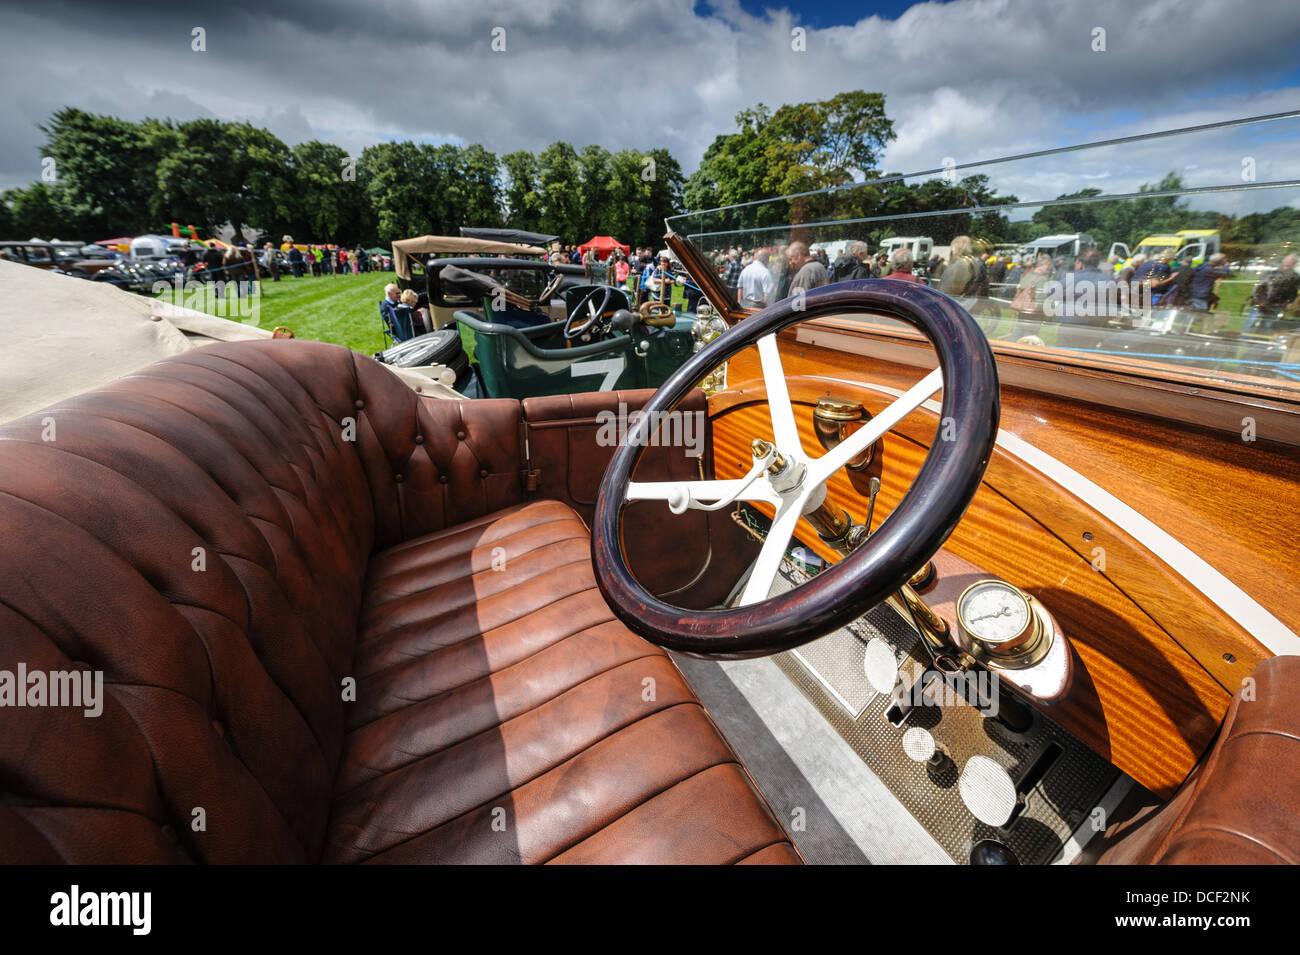 Vintage Car Rally in Biggar, South Lanarkshire, Scotland - Stock Image